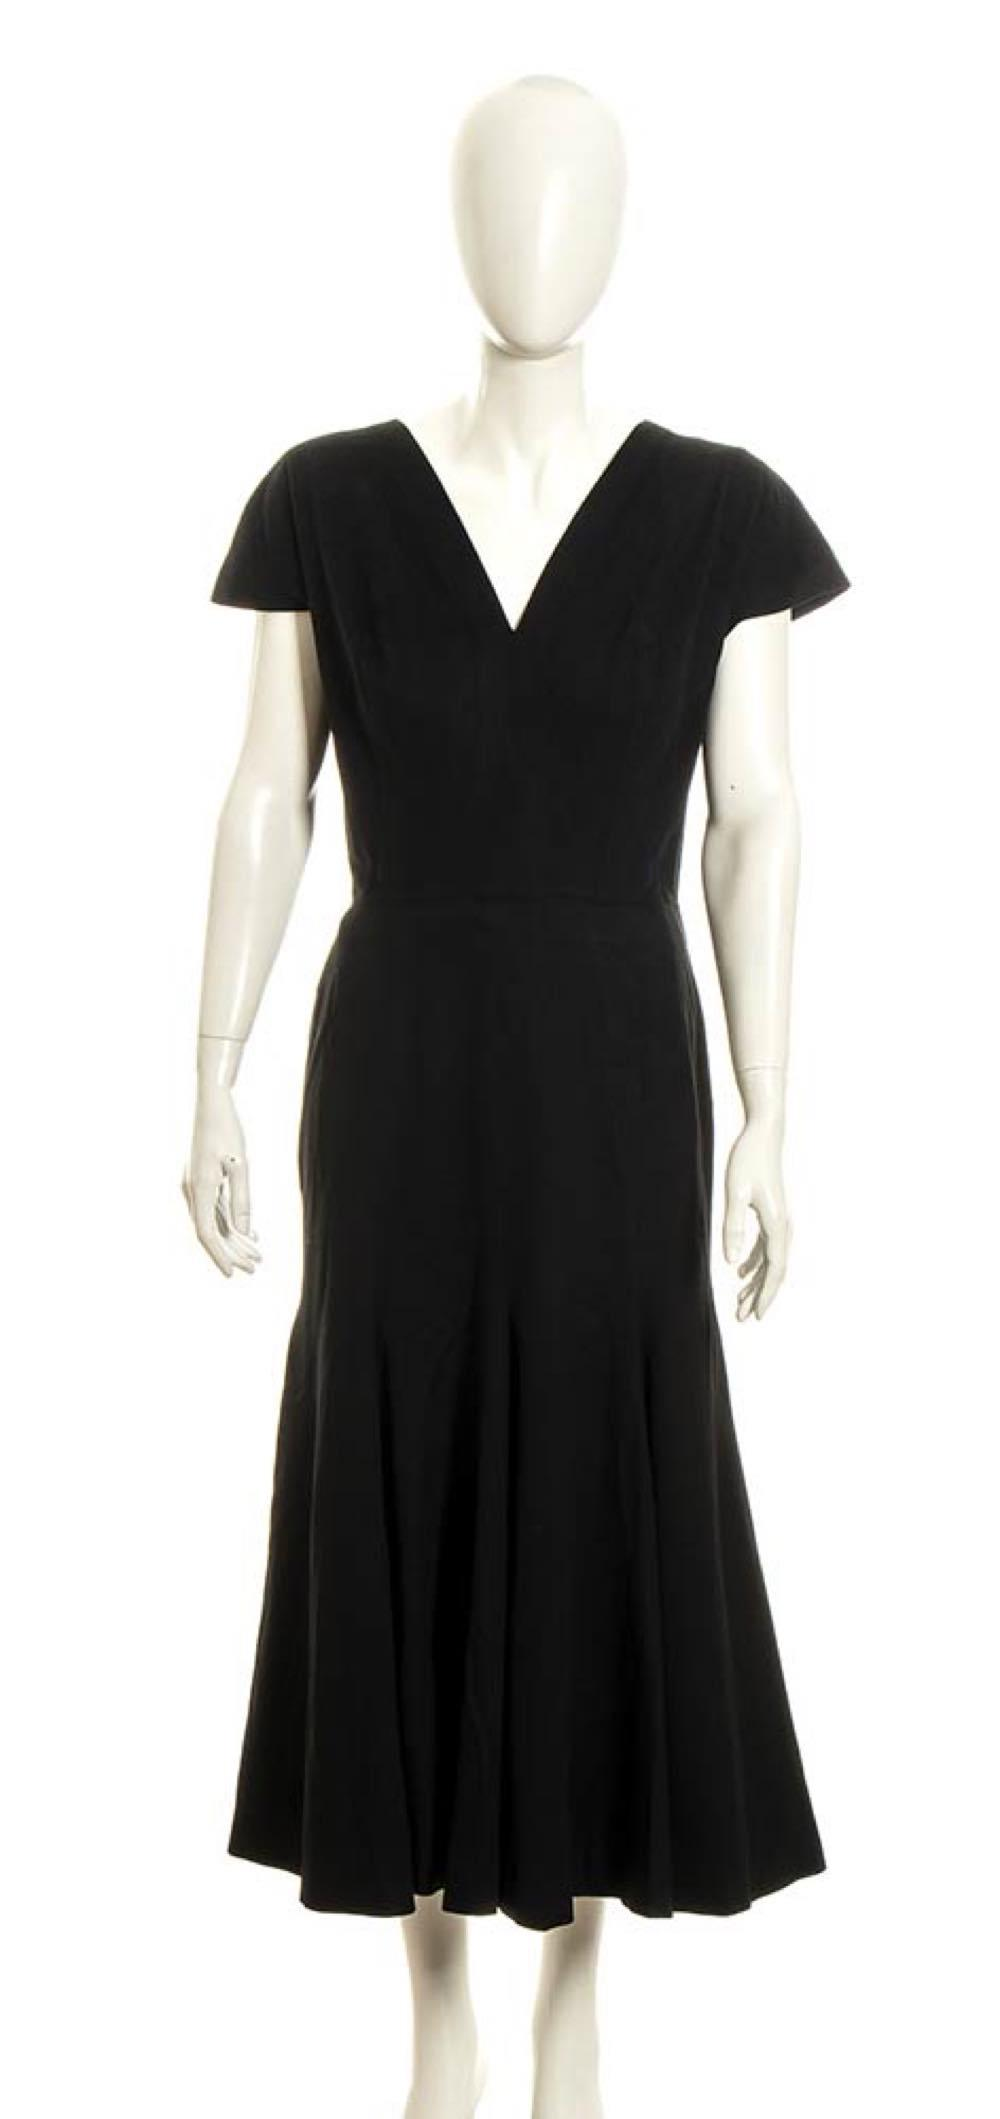 ELSA SCHIAPARELLI - WOOL DRESS - 40s